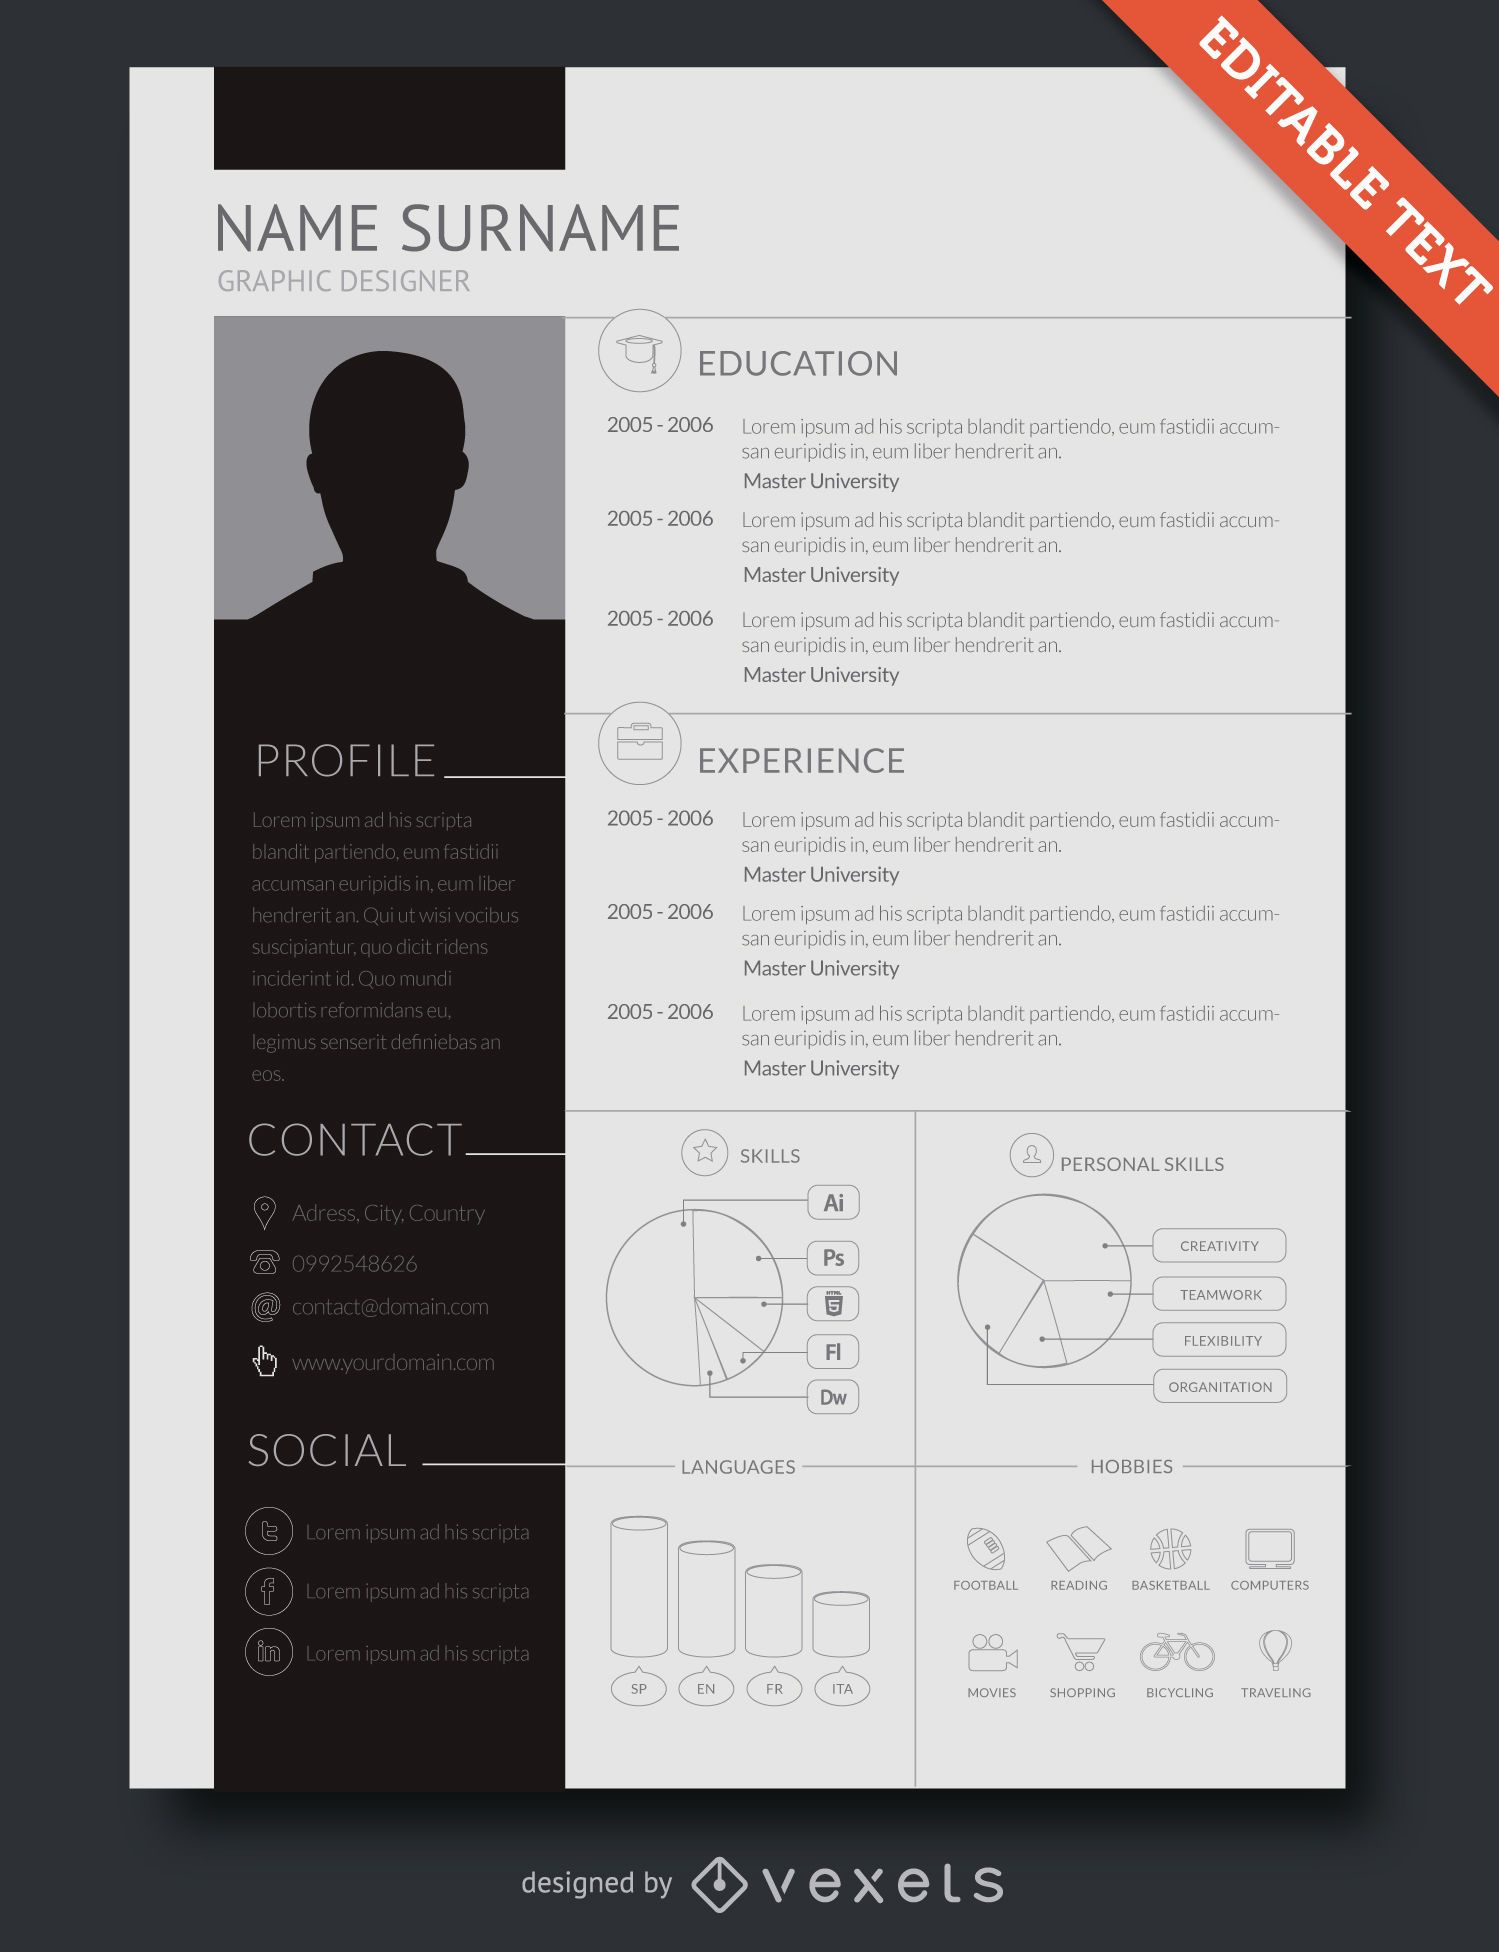 Flat design resume template - Vector download